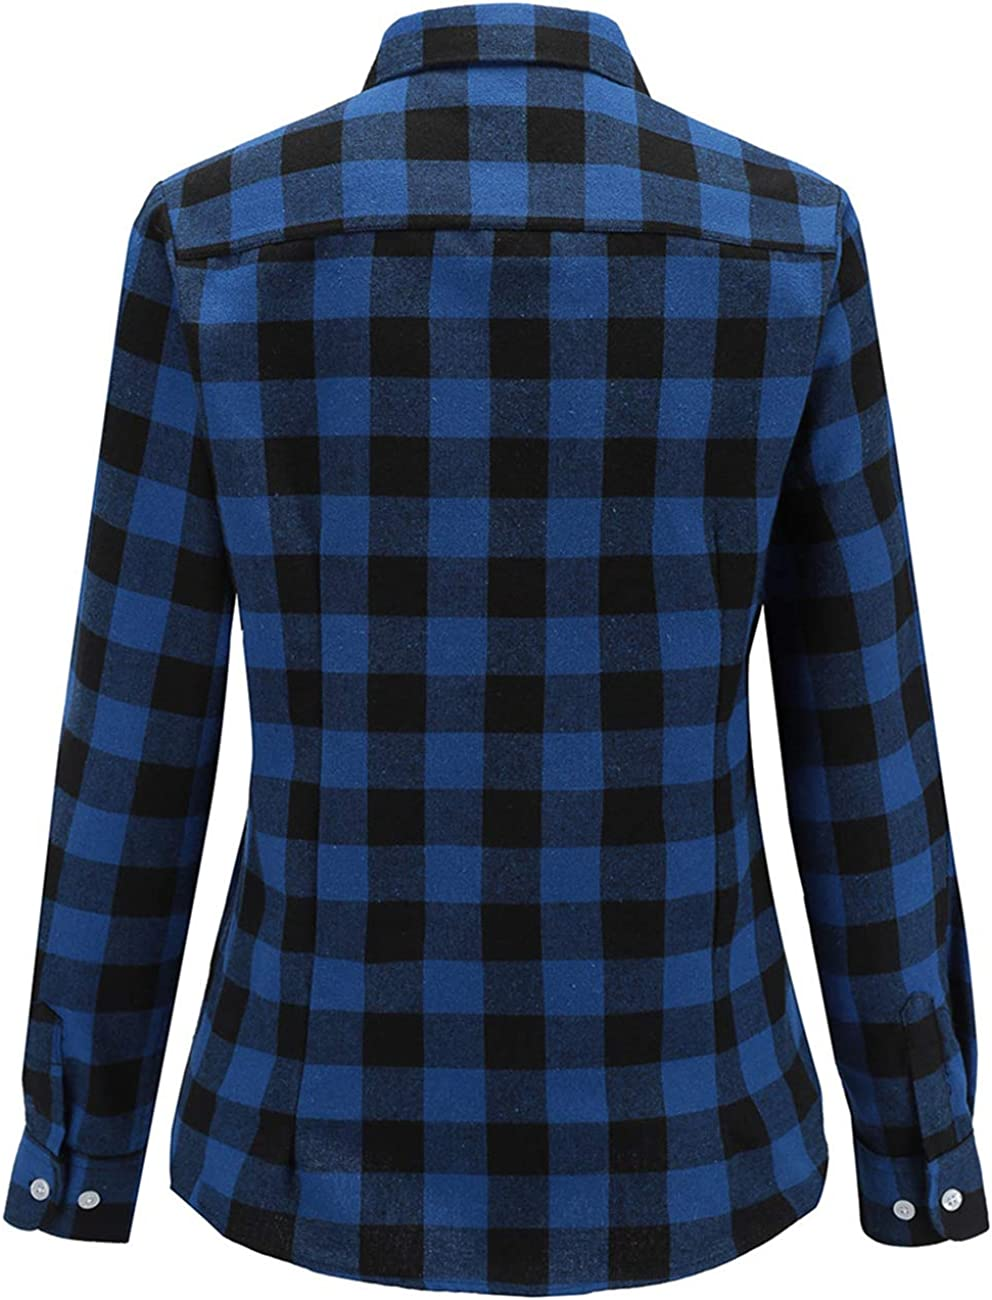 Dioufond Flannel Shirts for Women Long Sleeve Womens Buffalo Plaid Shirt